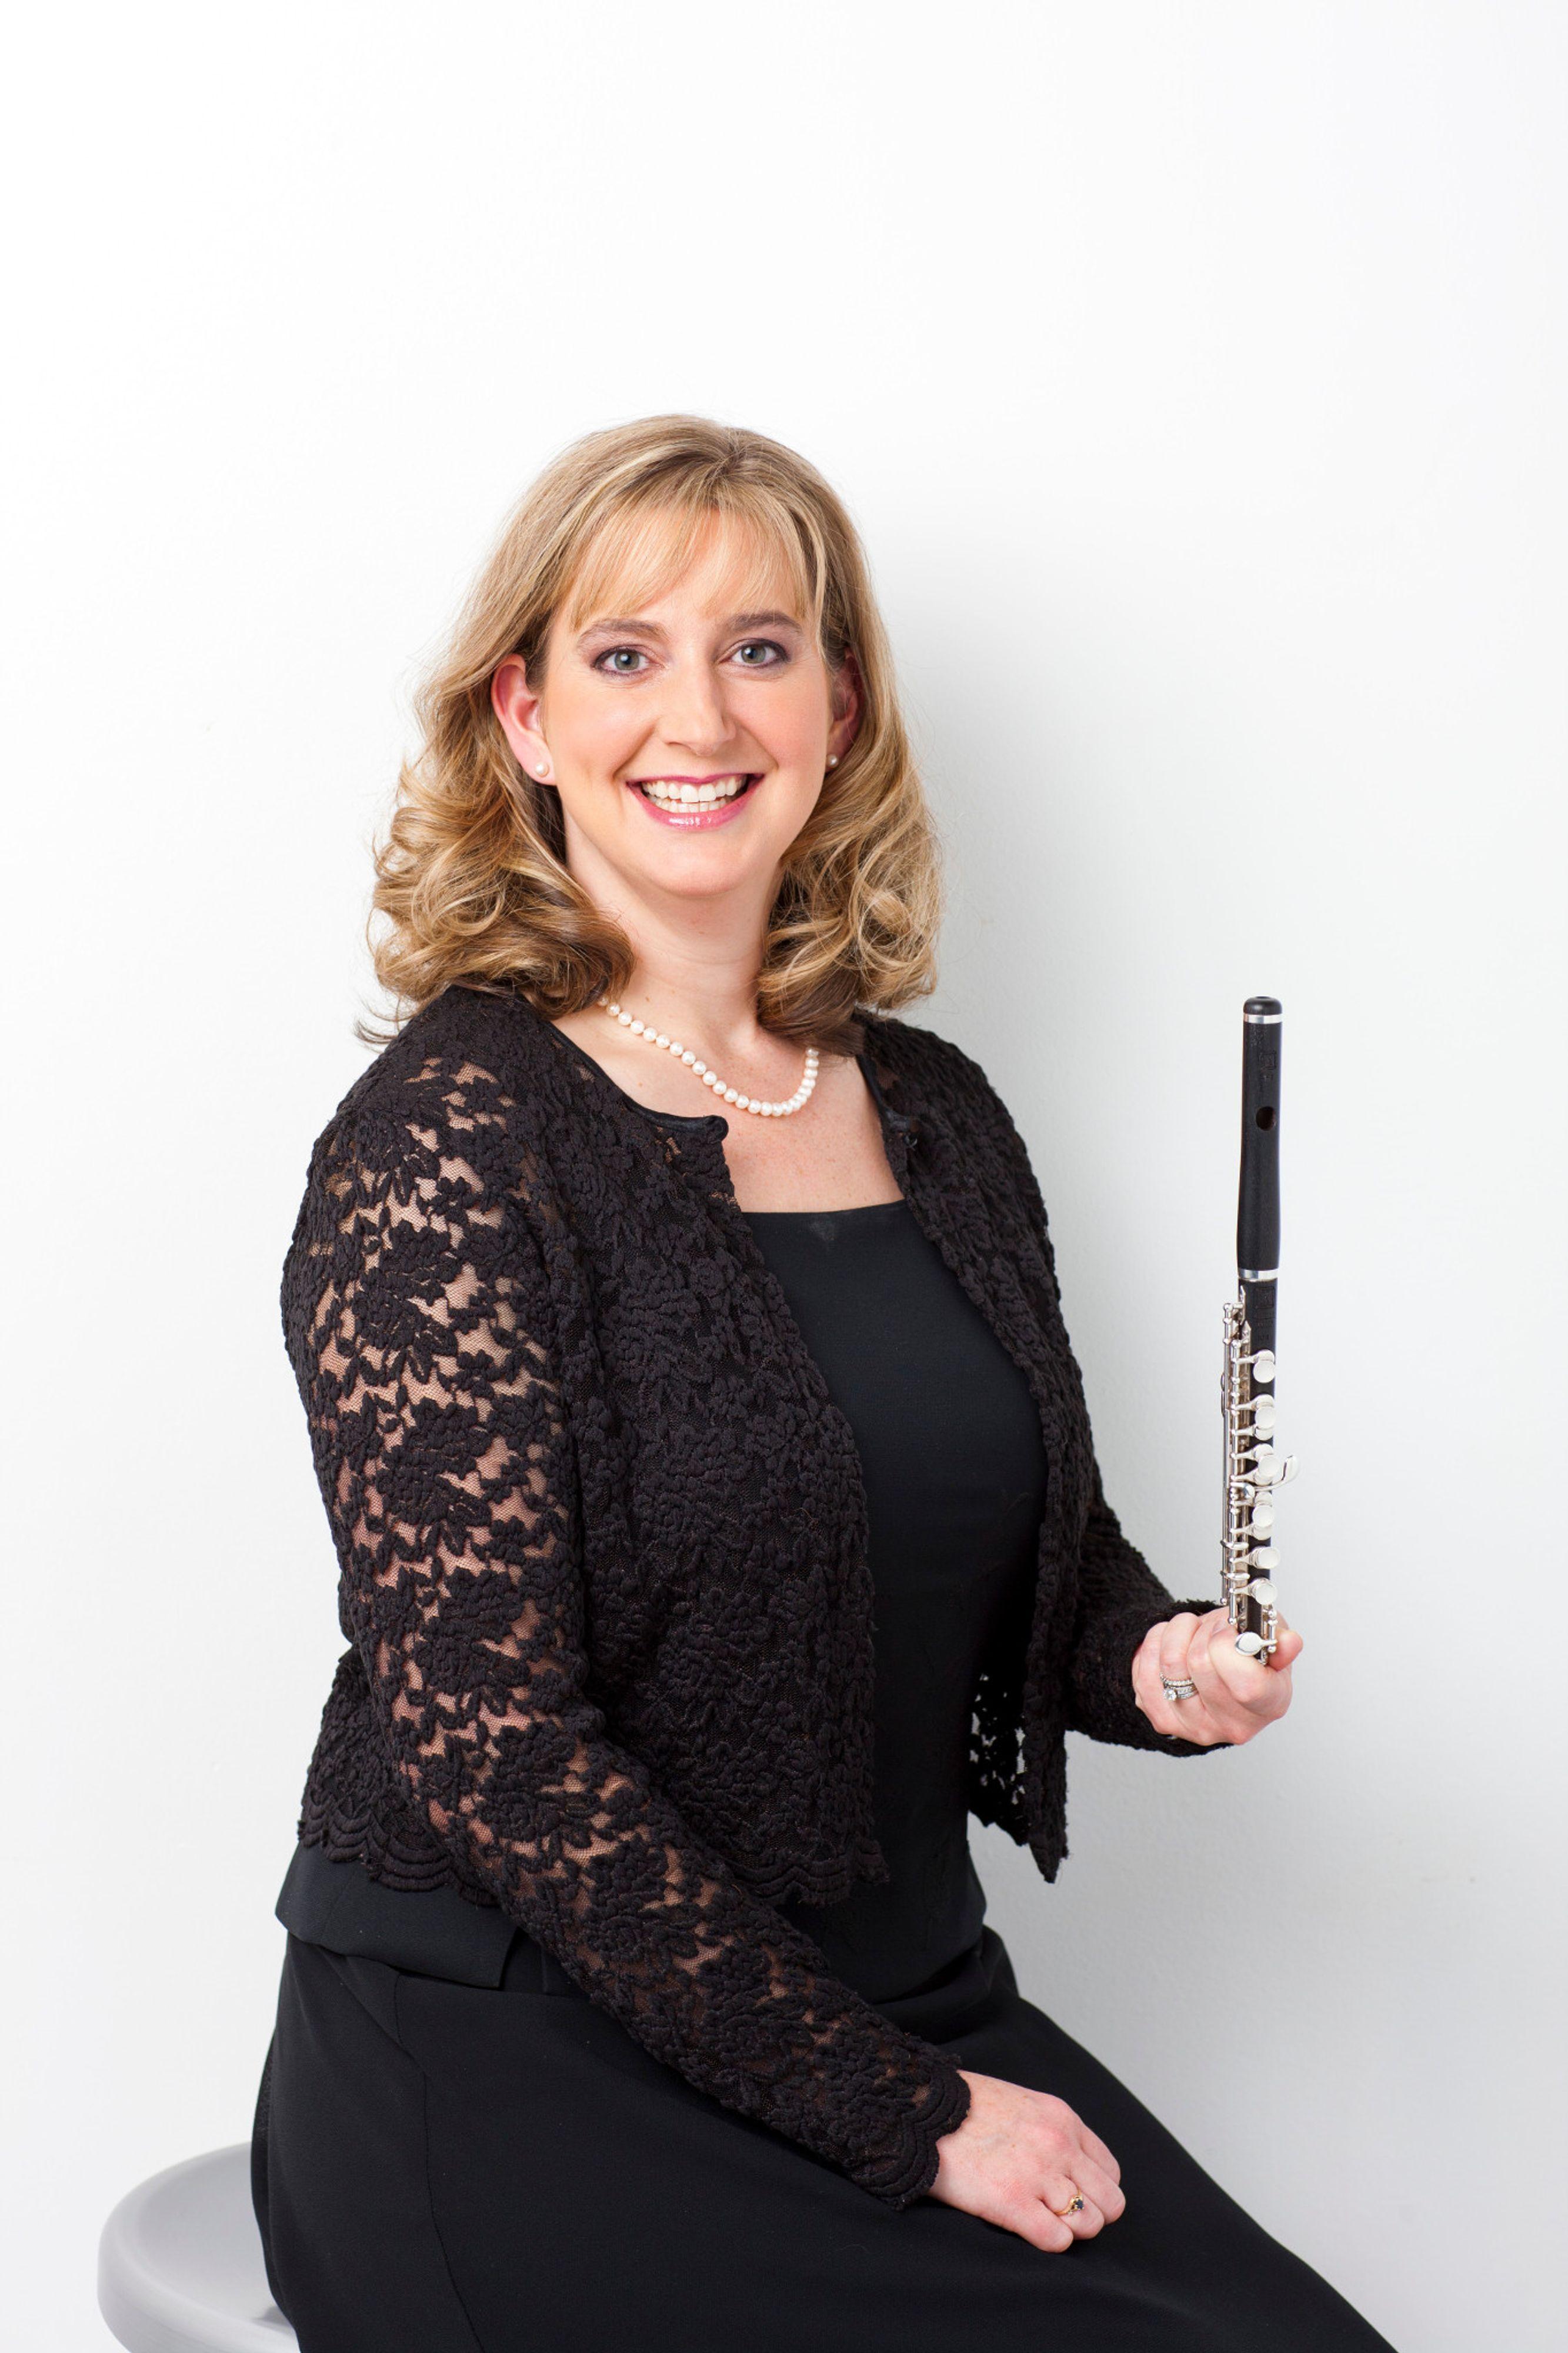 Julie Duncan Thronton holding a flute